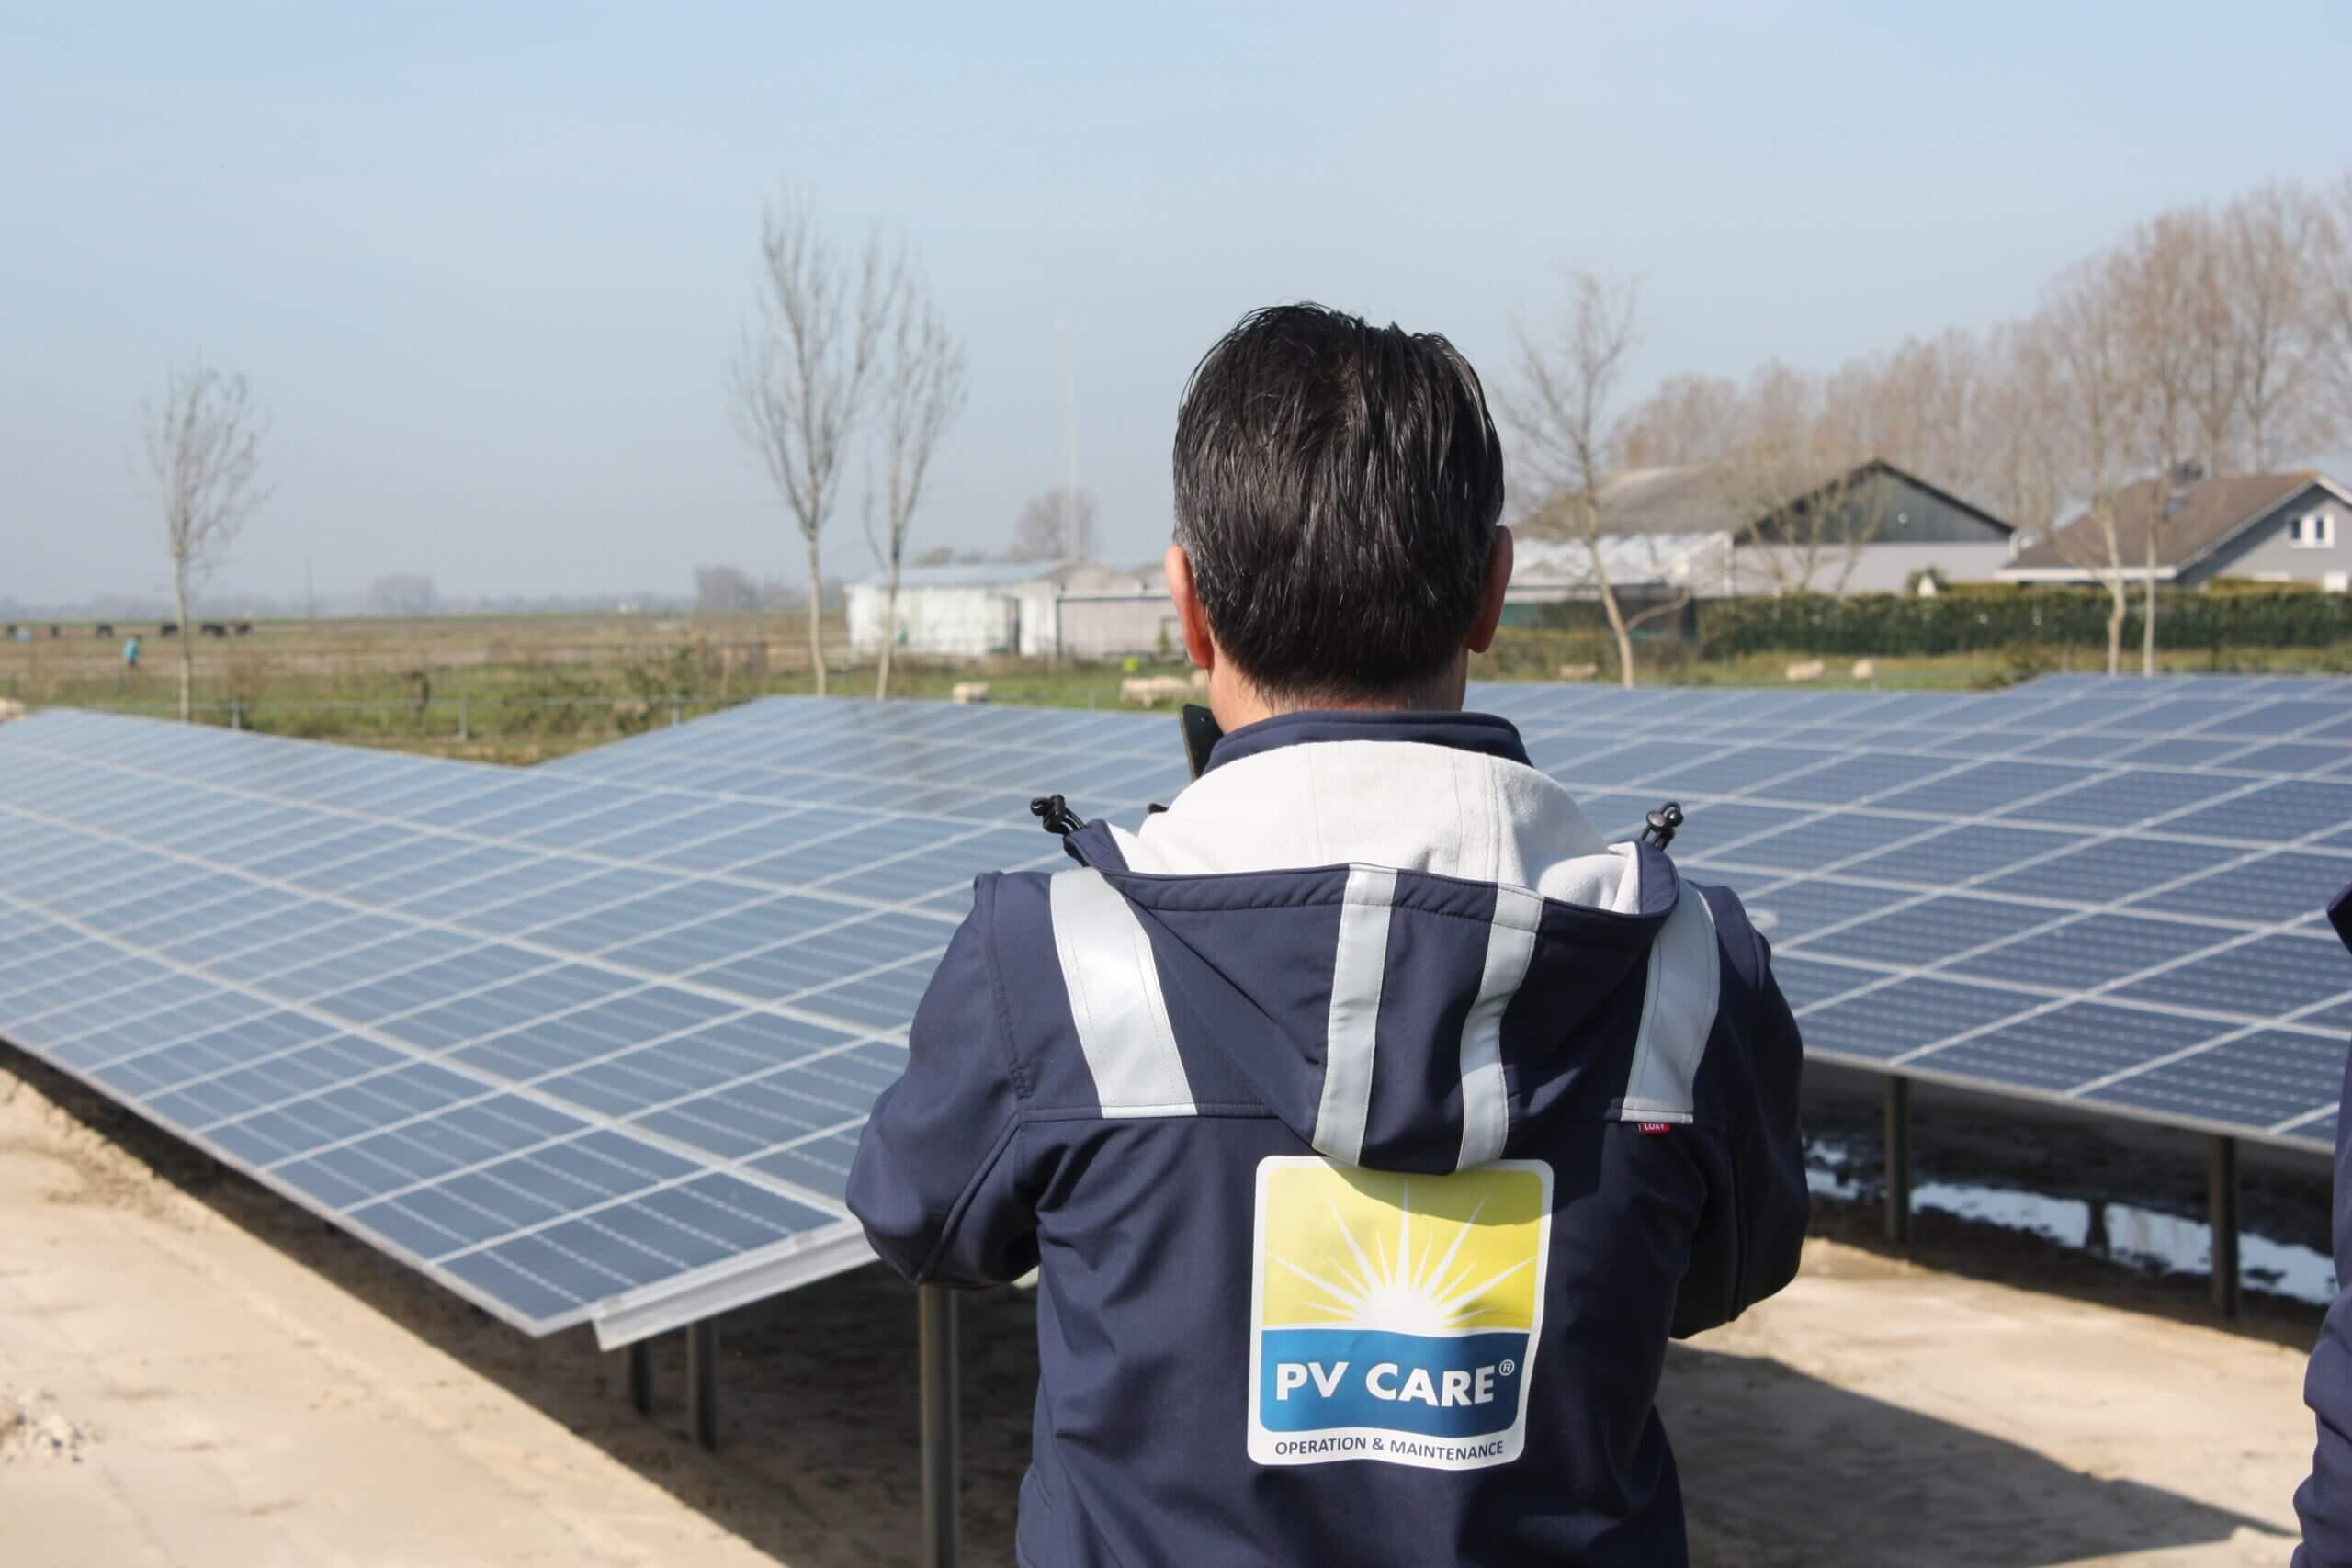 pv care inspectie zonne-energiesysteem